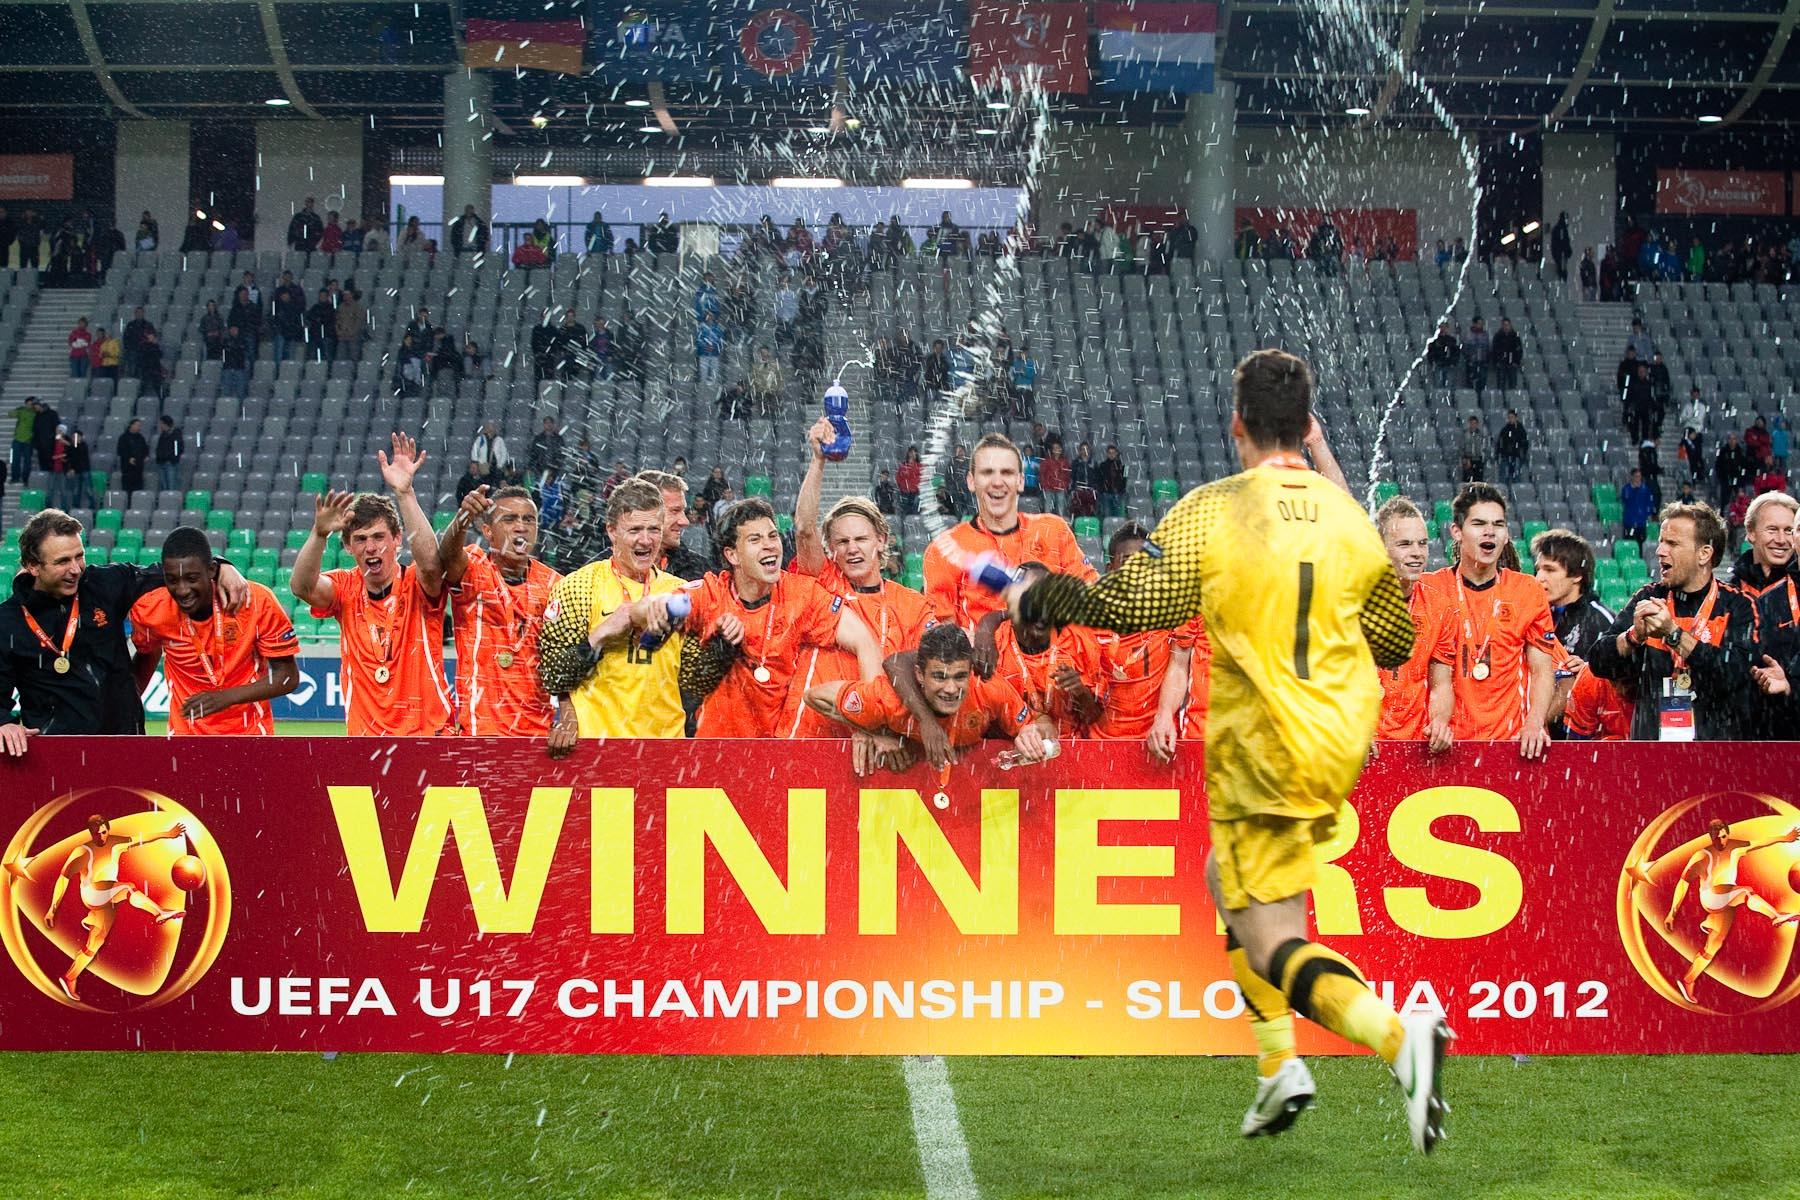 Nick Olij, Netherlands\' goalkeeper, jumps as Team Netherlands celebrates winning the UEFA U-17 European Championship final match between Germany and the Netherlands at the SRC Stozice Stadium in Ljubljana, Slovenia, May 16, 2012.